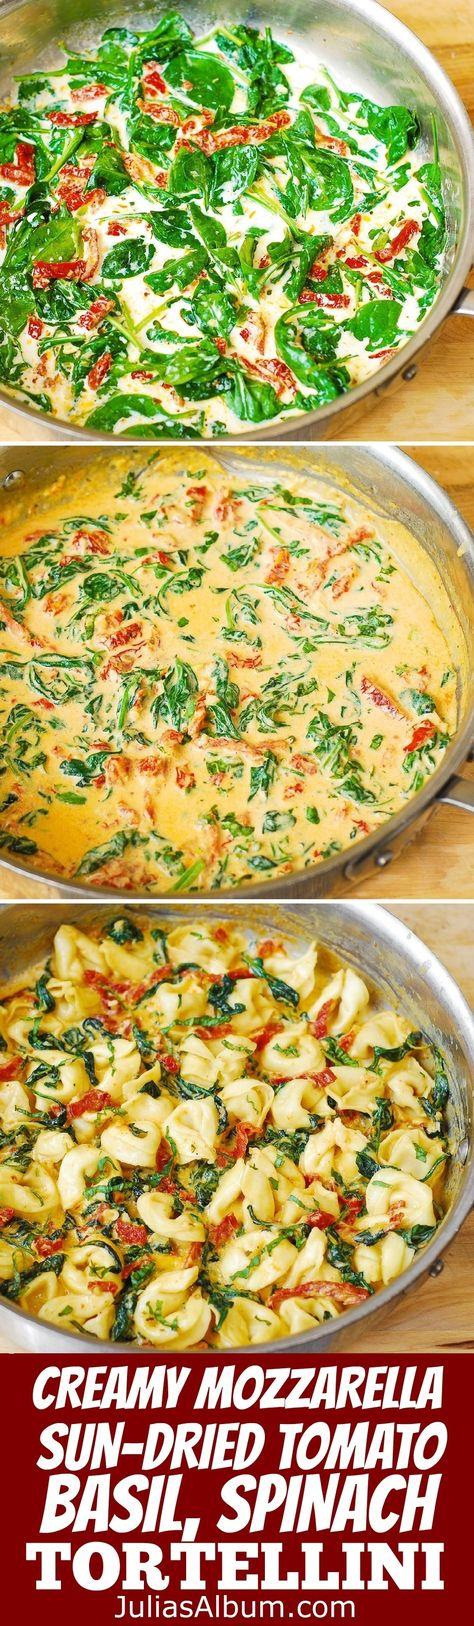 ... ideas about Tortellini on Pinterest | Pasta, Soups and Tortellini Soup